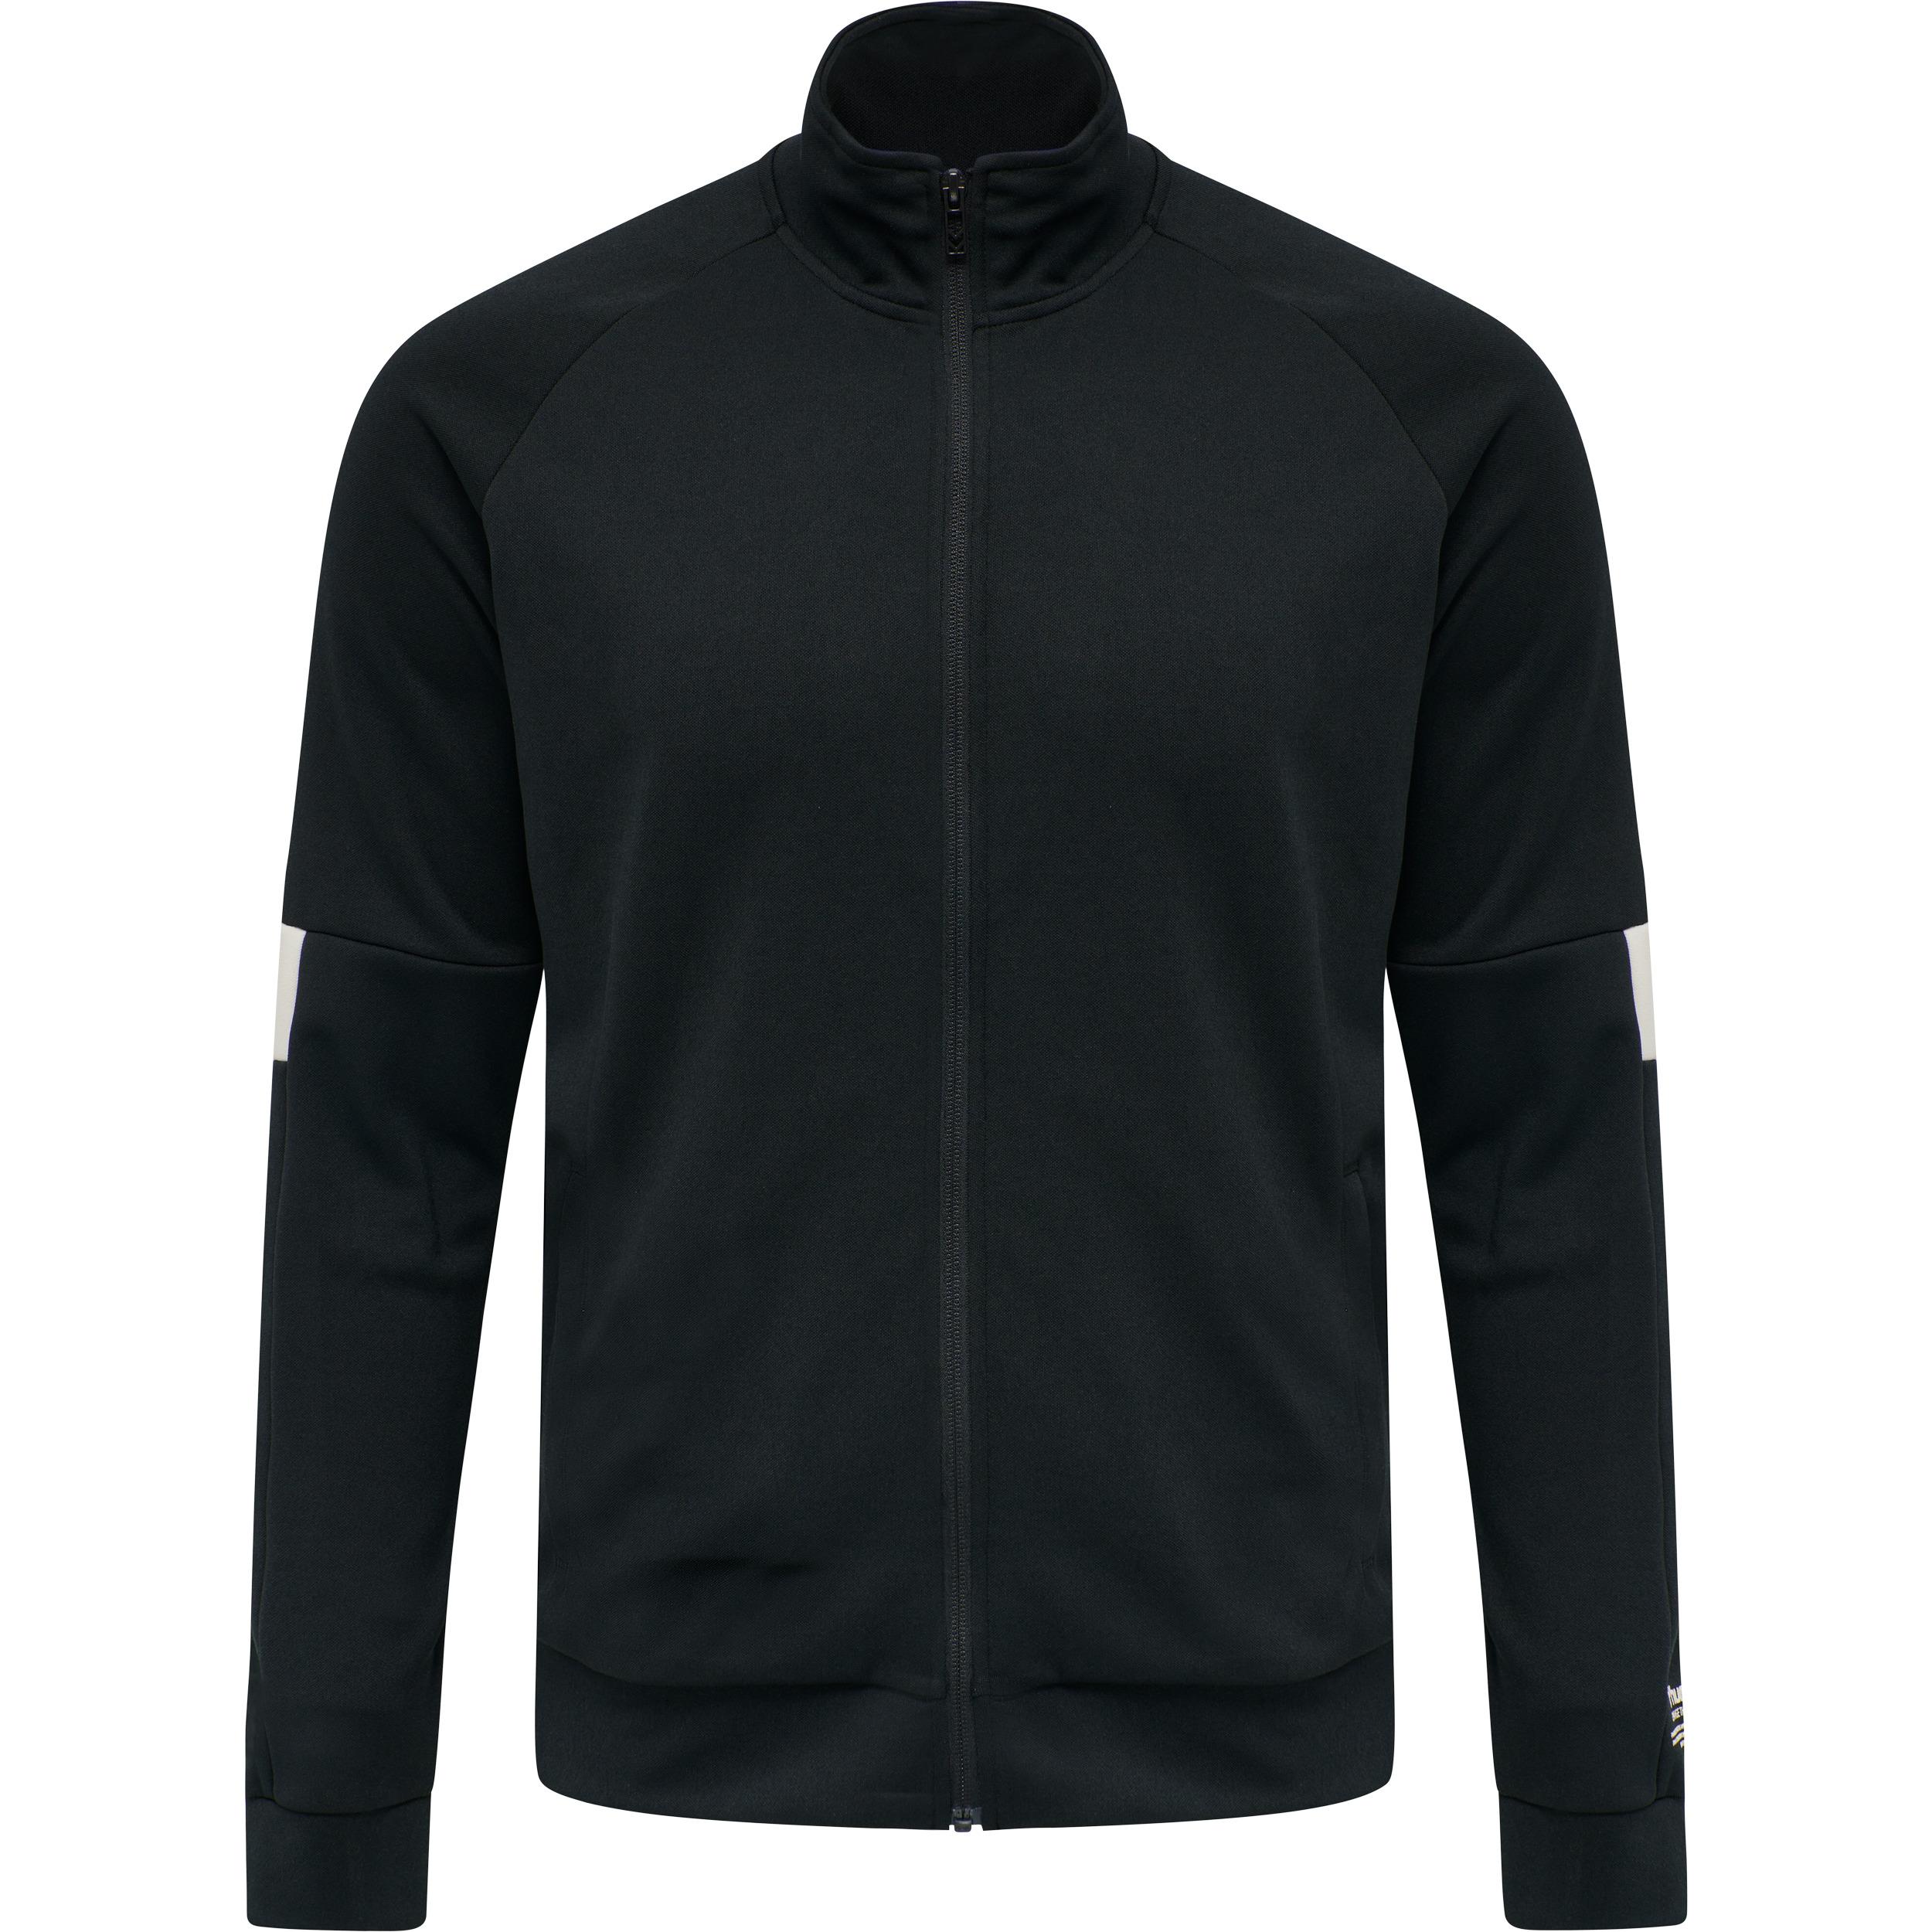 Hummel Lalec zip jacket, black, large